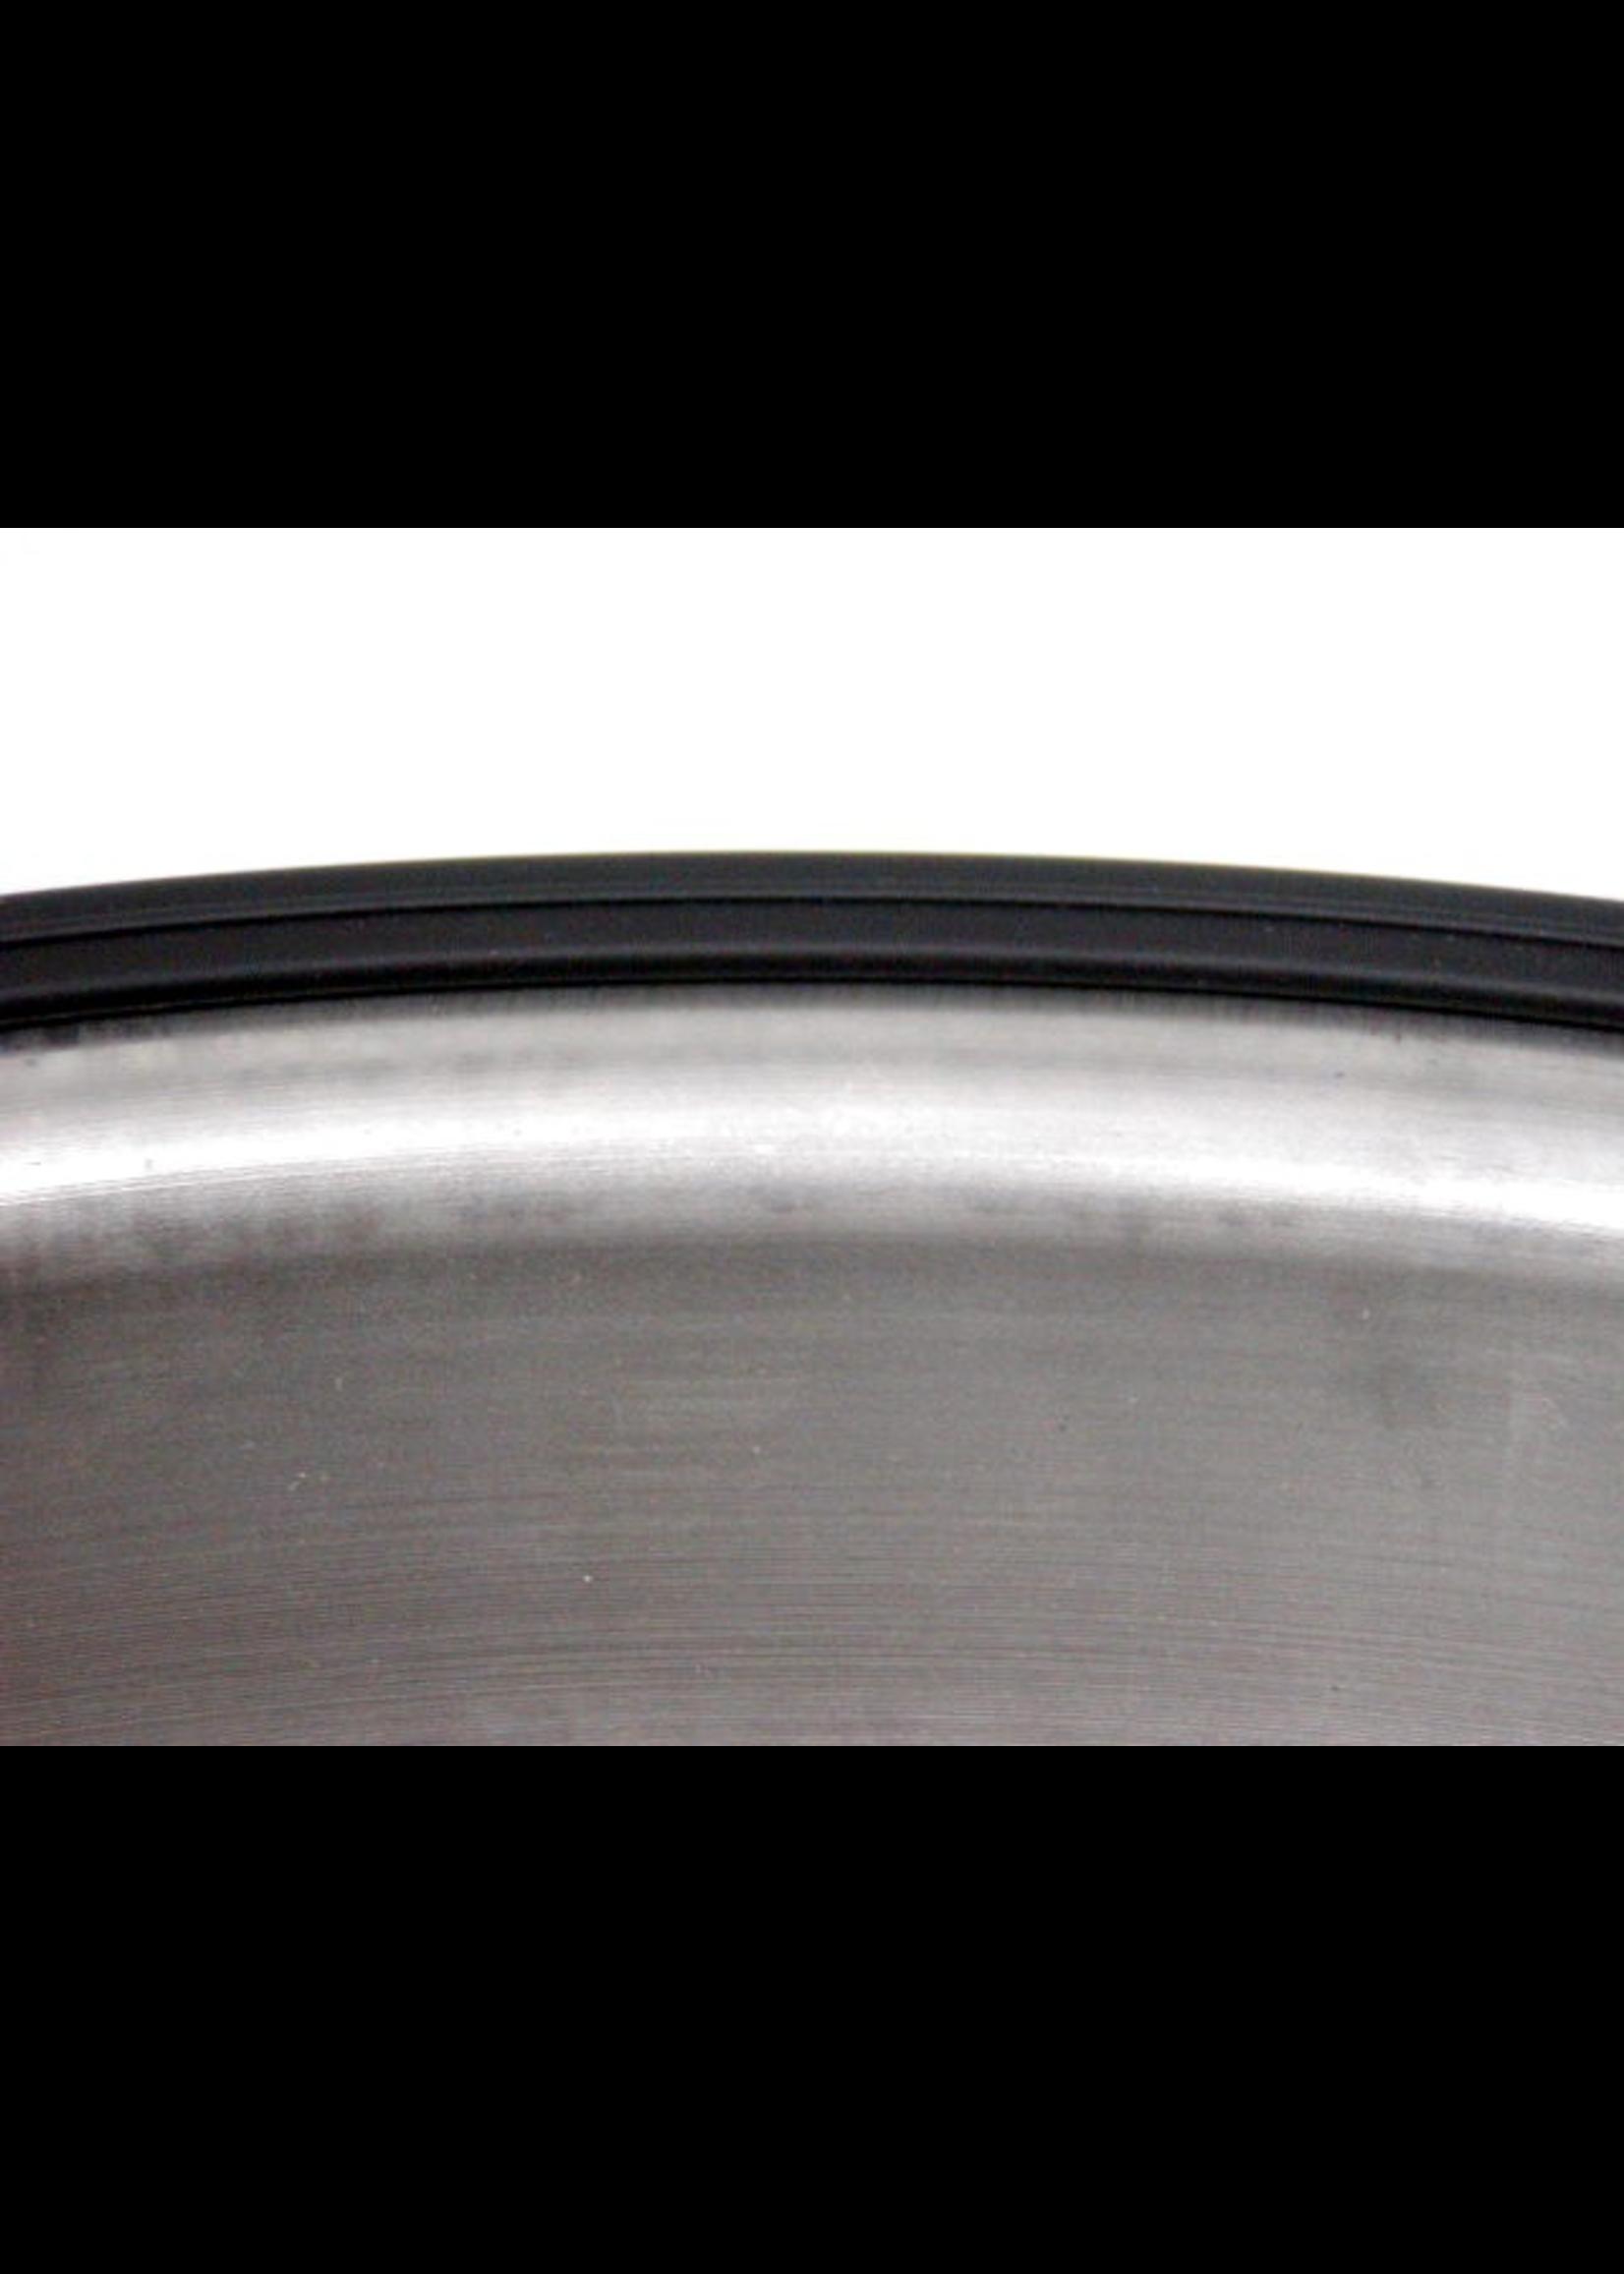 Blichmann Blichmann Fermenator - Replacement Lid Gasket for 14.5 Gallon Conical